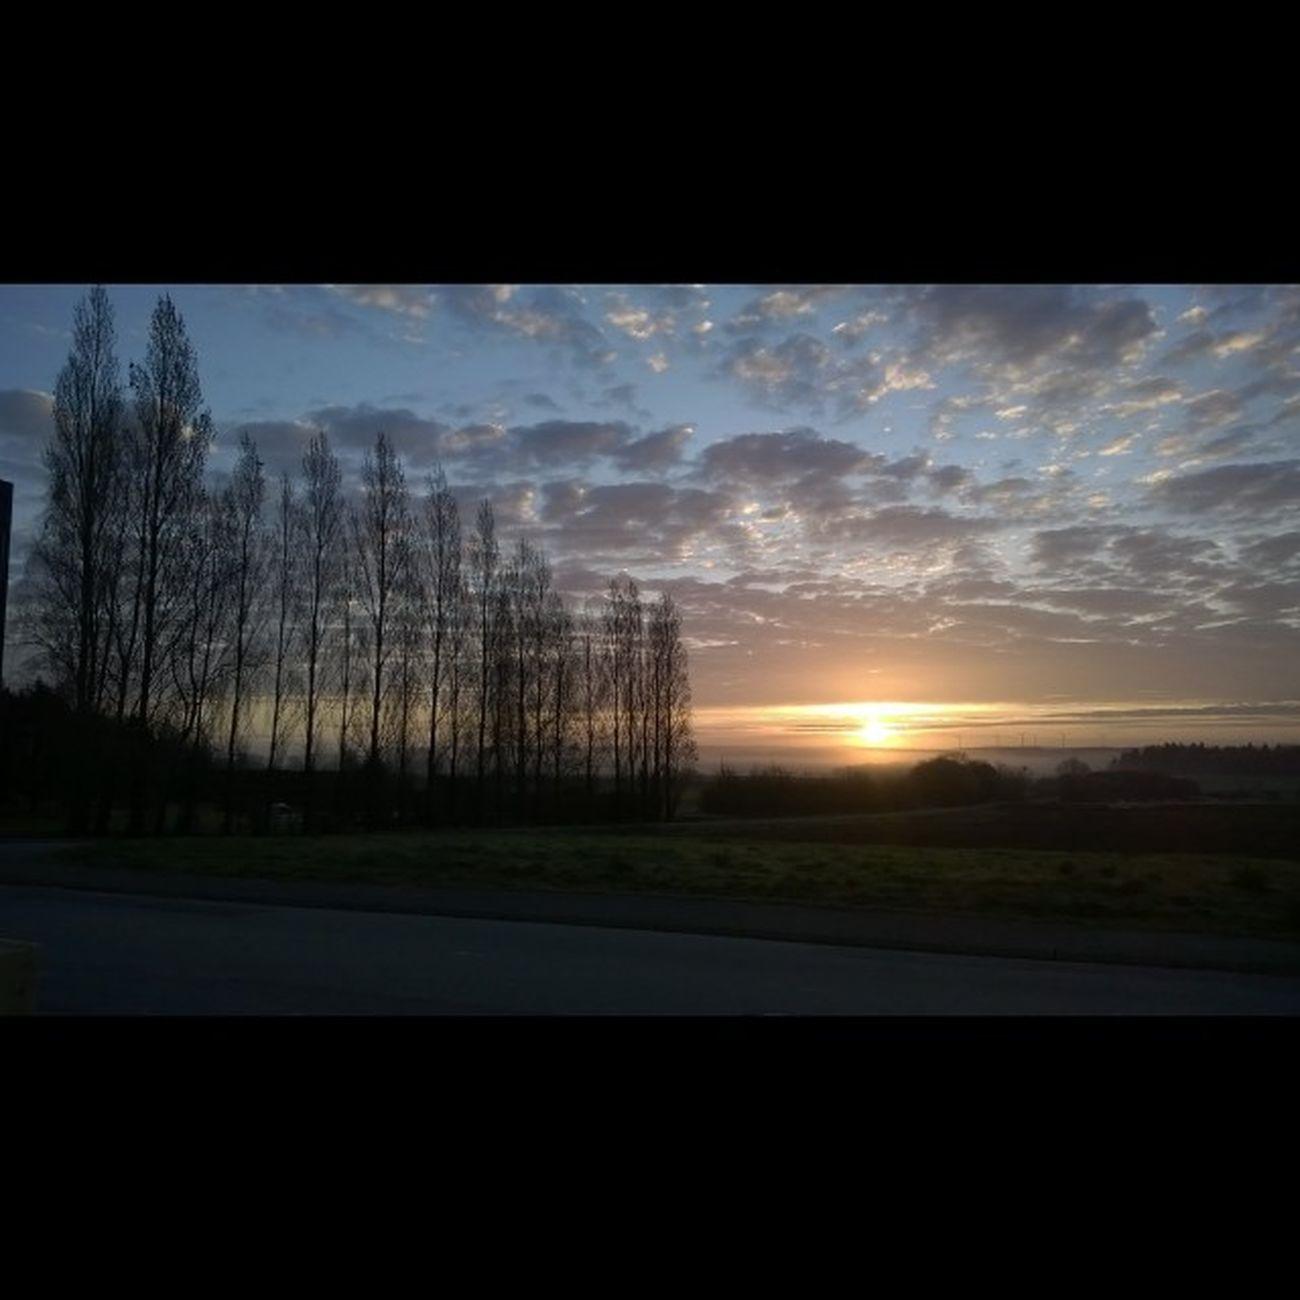 Sunrise Leverdesoleil Taupont Bretagne Bretagnetourisme Morbihan Miamorbihan Breizh Sun Soleil Sole Sol Sonne Nofilter